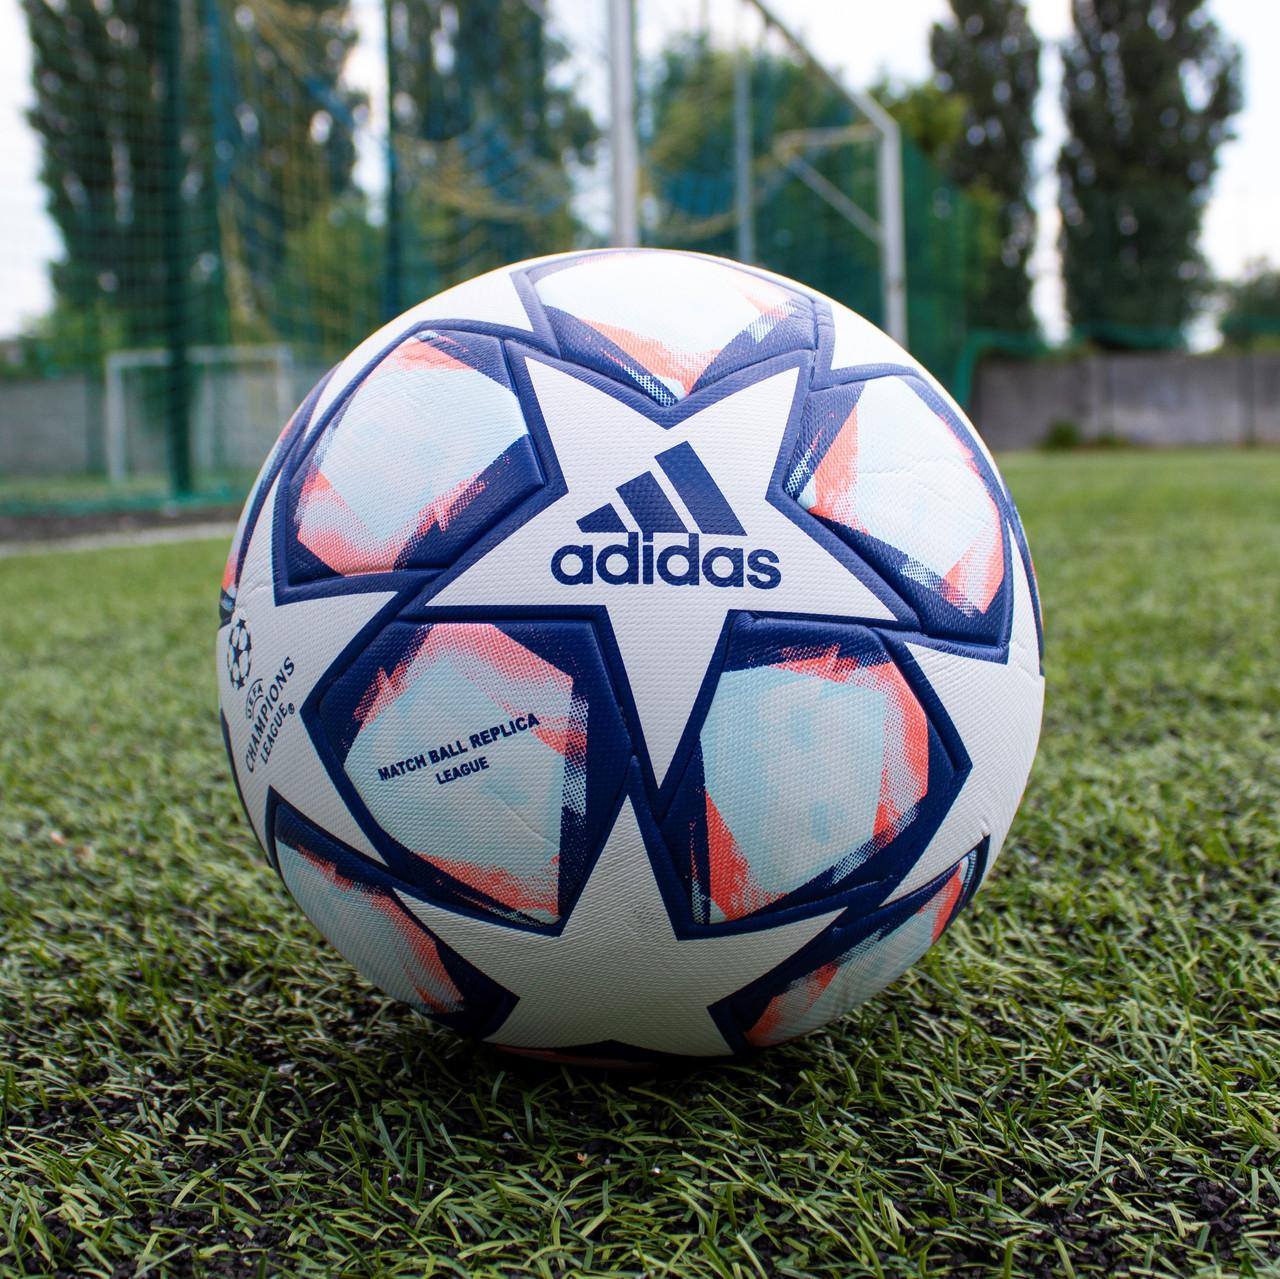 Adidas UEFA Champions League Final 2020 Official Match Ball